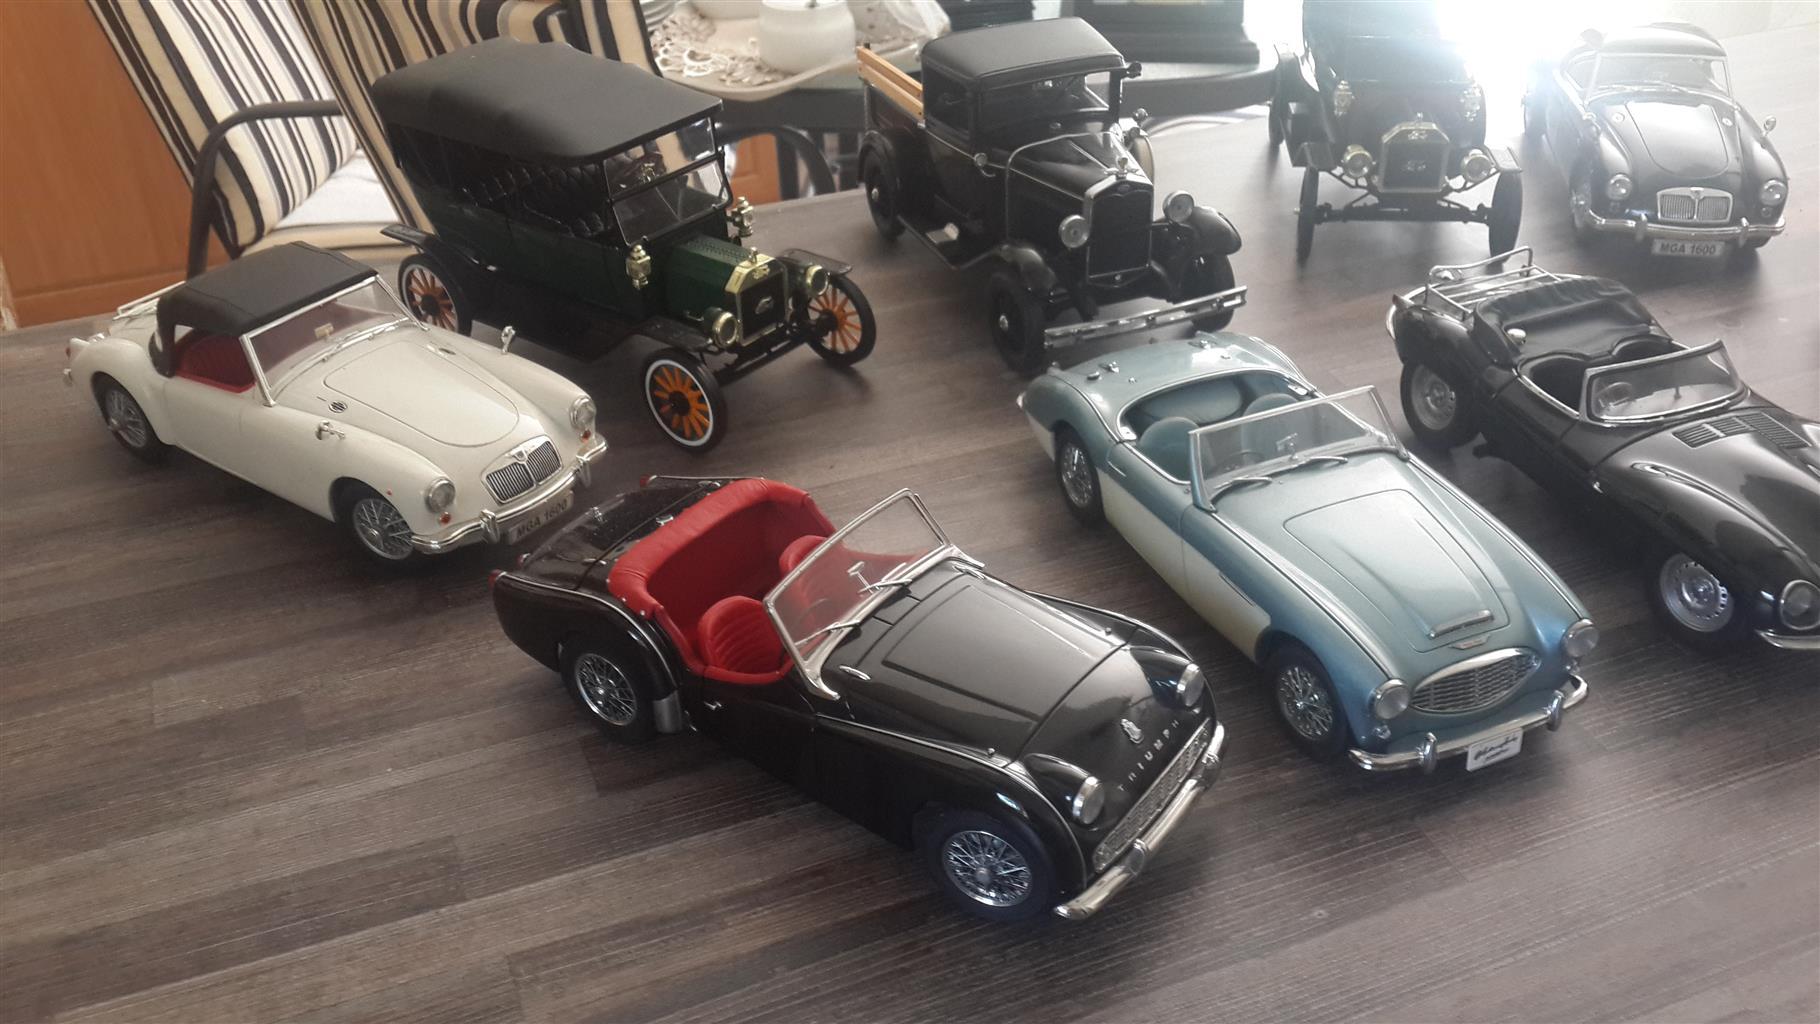 1/18th model cars